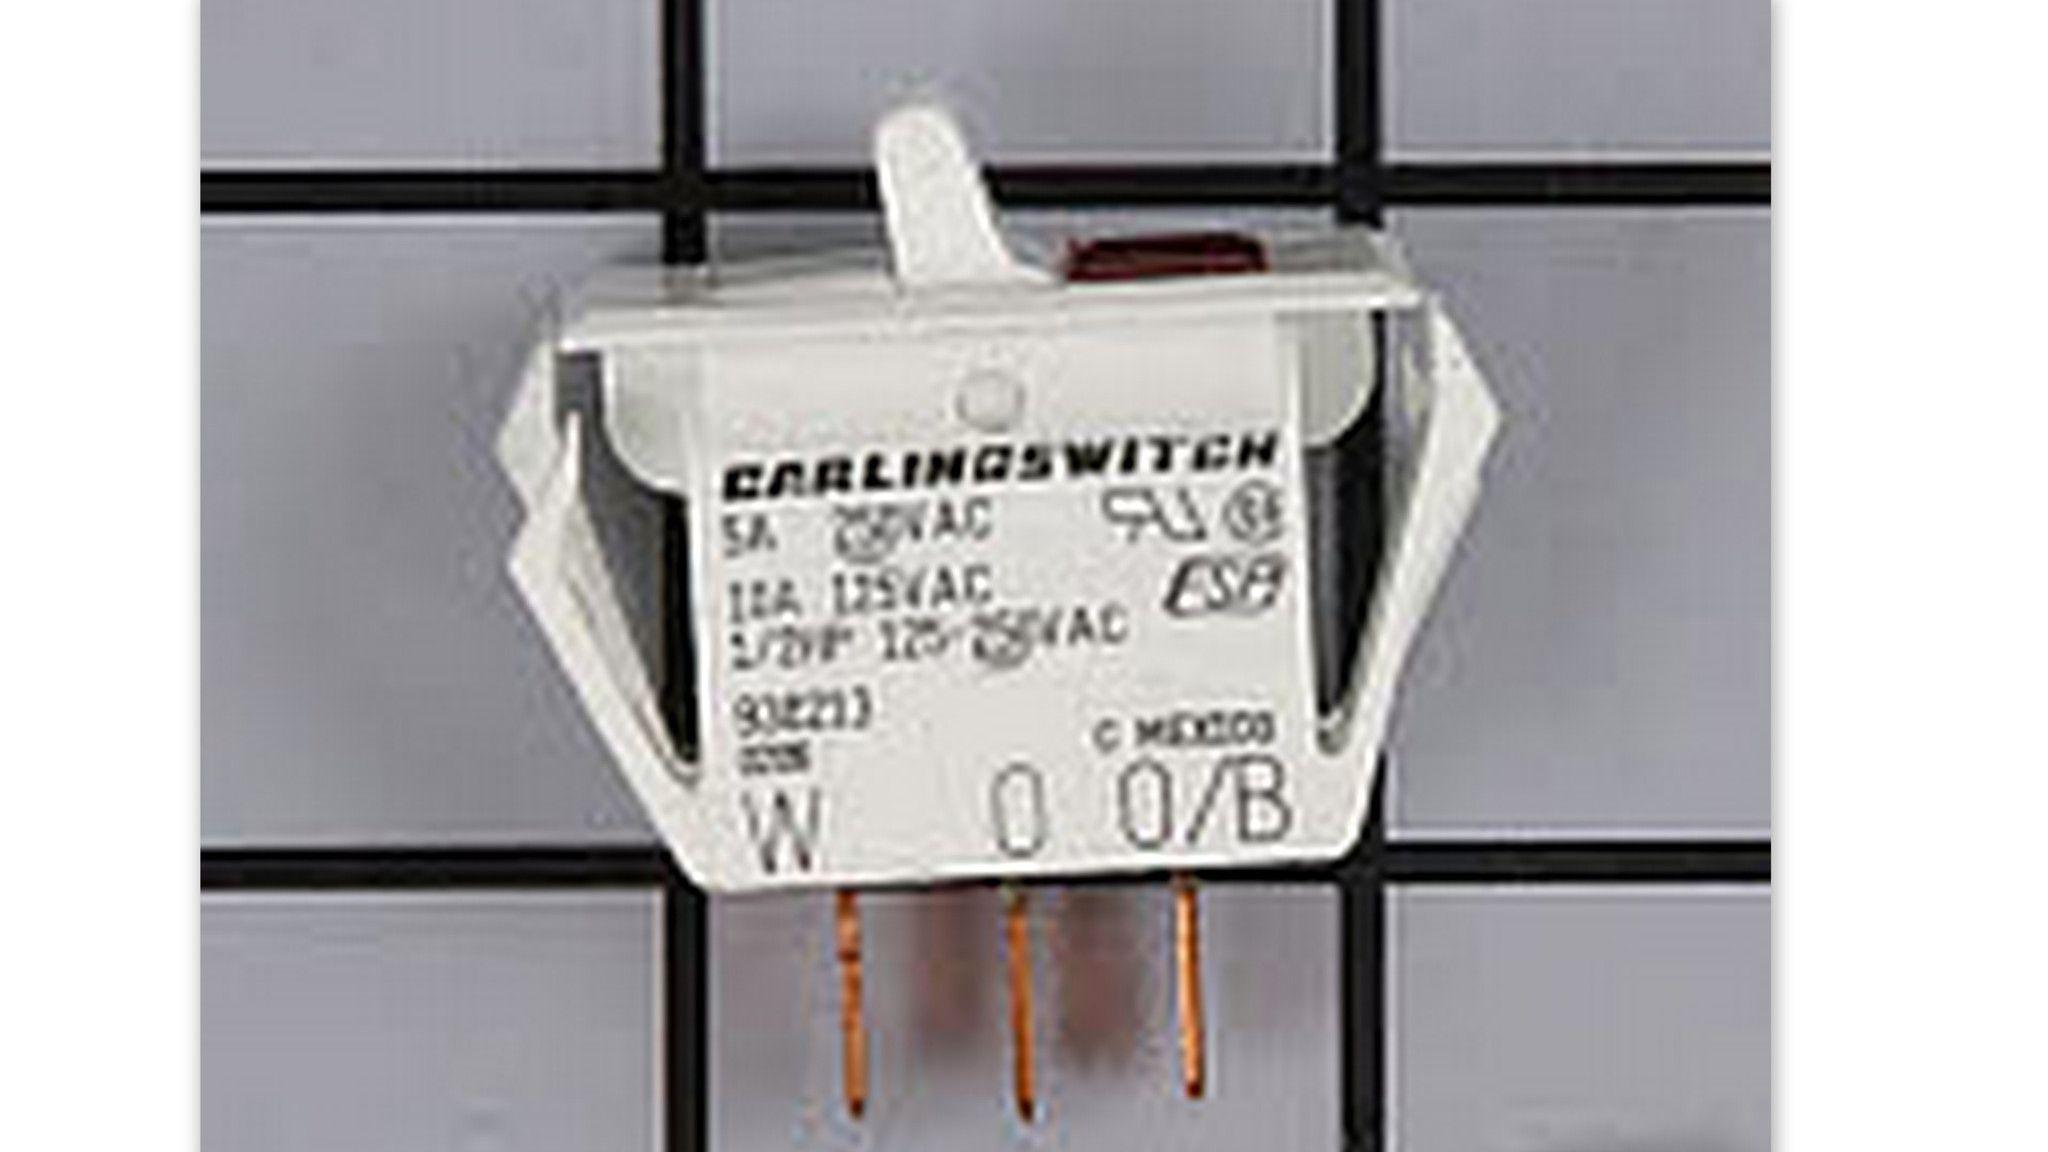 938213 Whirlpool Refrigerator Energy Saver Toggle Switch